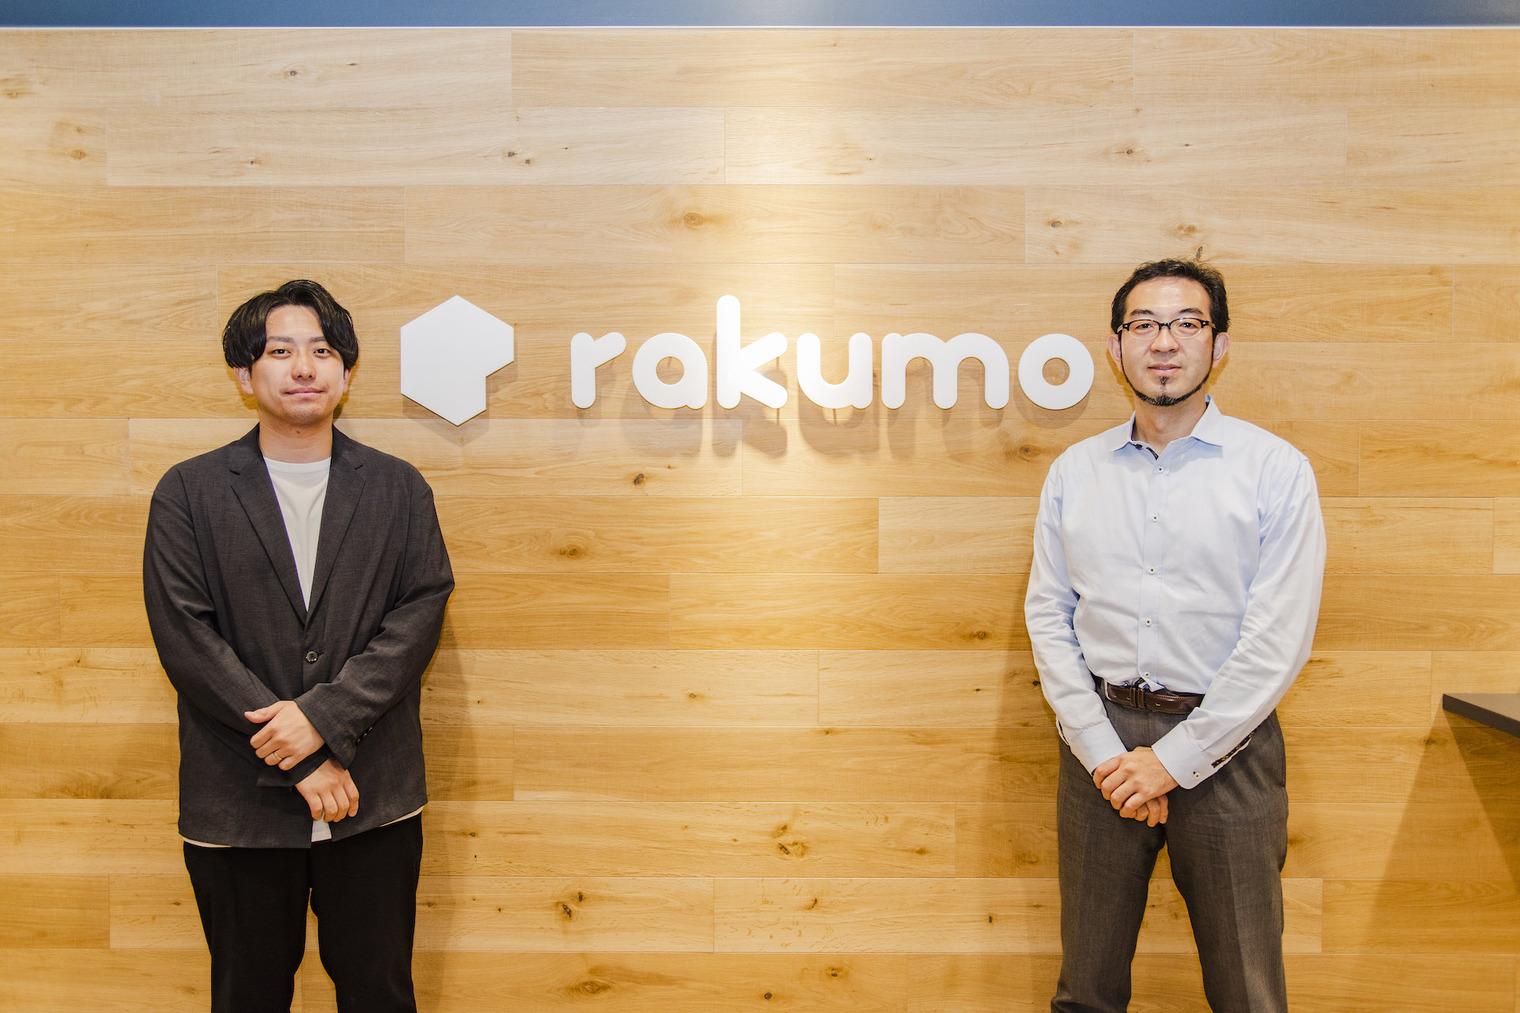 rakumo 株式会社